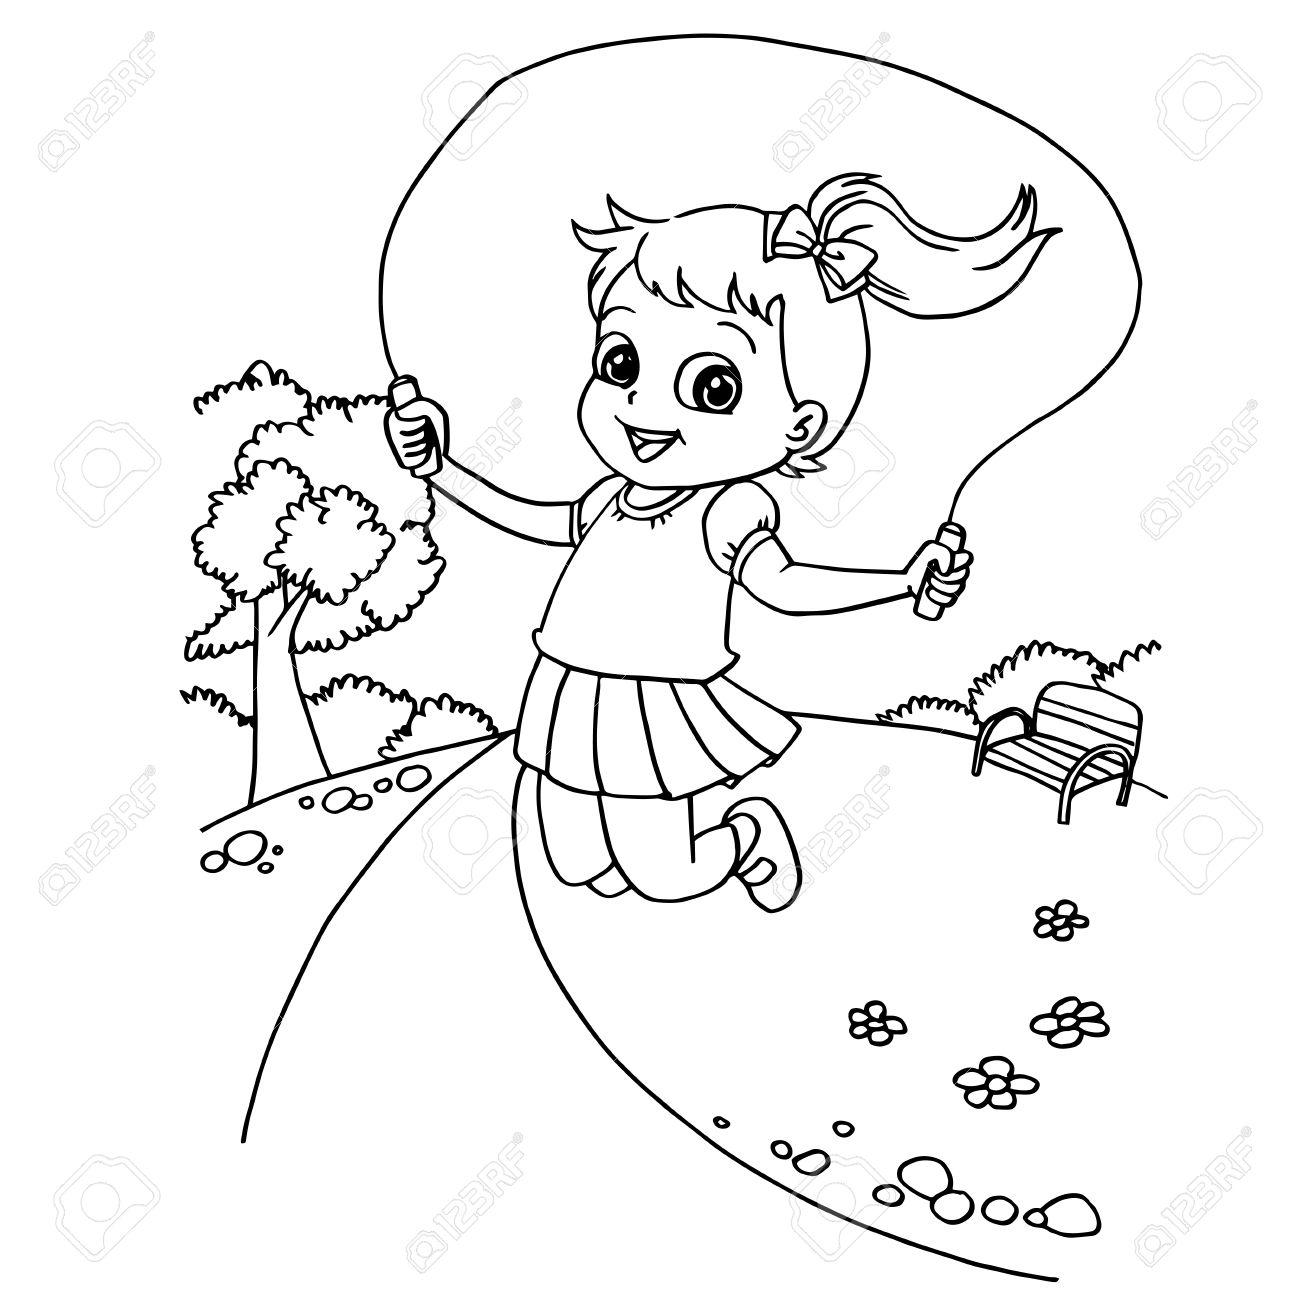 Kid Jumping Rope Cartoon Coloring Page Vector Illustration Stock